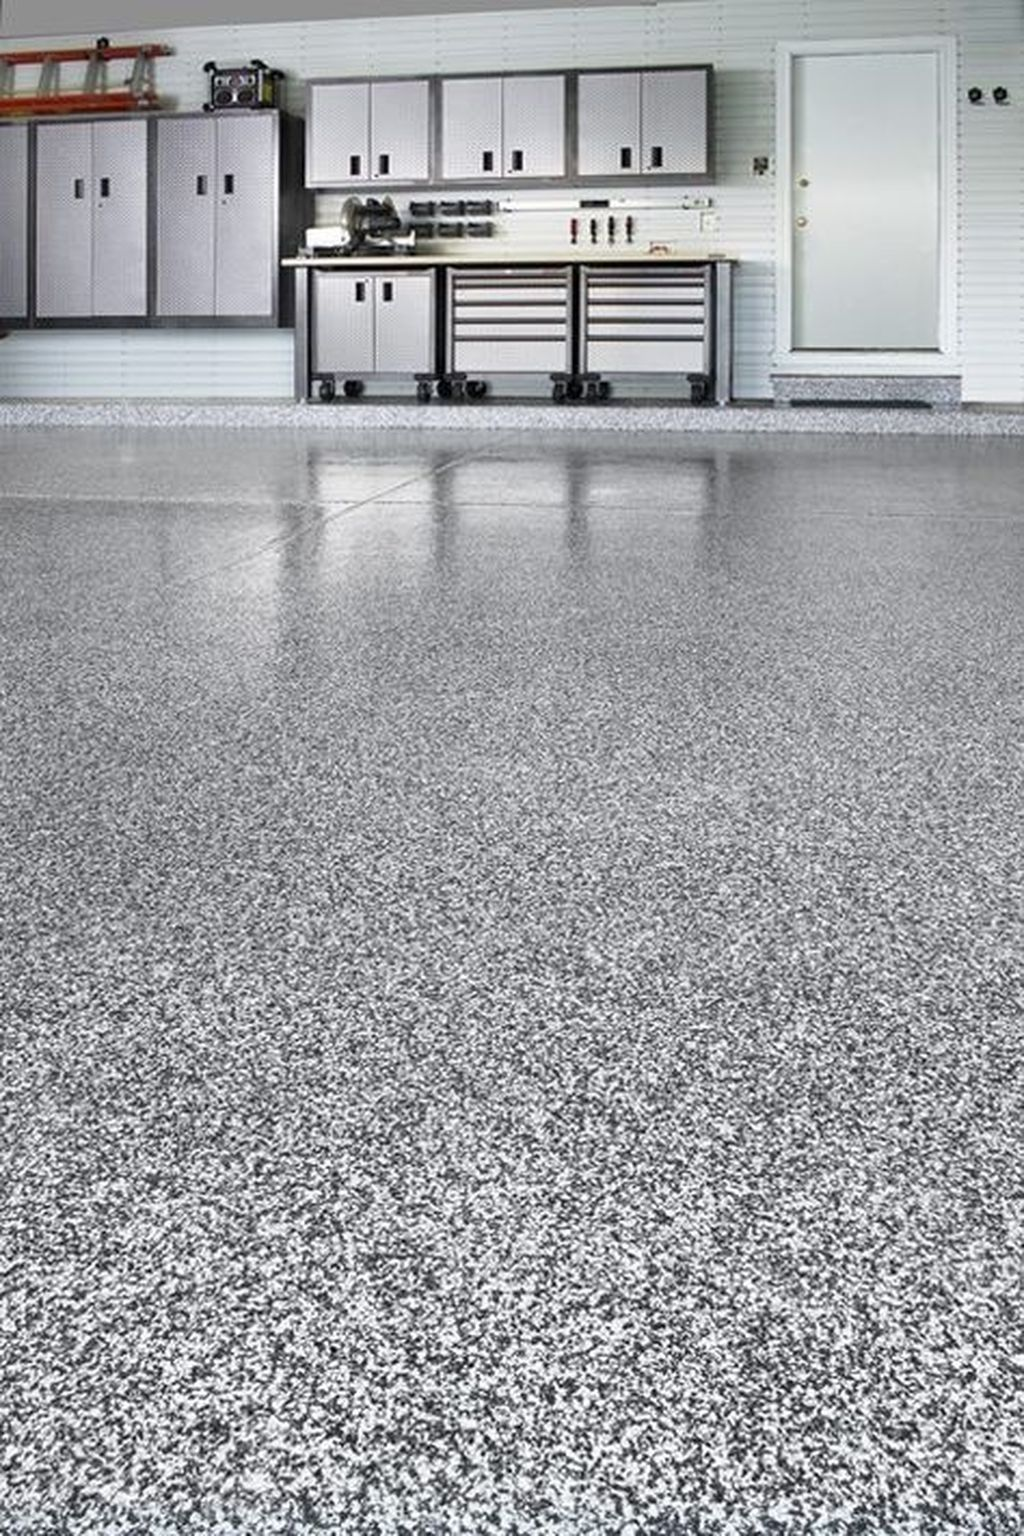 20 Pretty Garage Floor Design Ideas That You Can Try In Your Home Coodecor Garage Floor Paint Garage Floor Coatings Garage Makeover